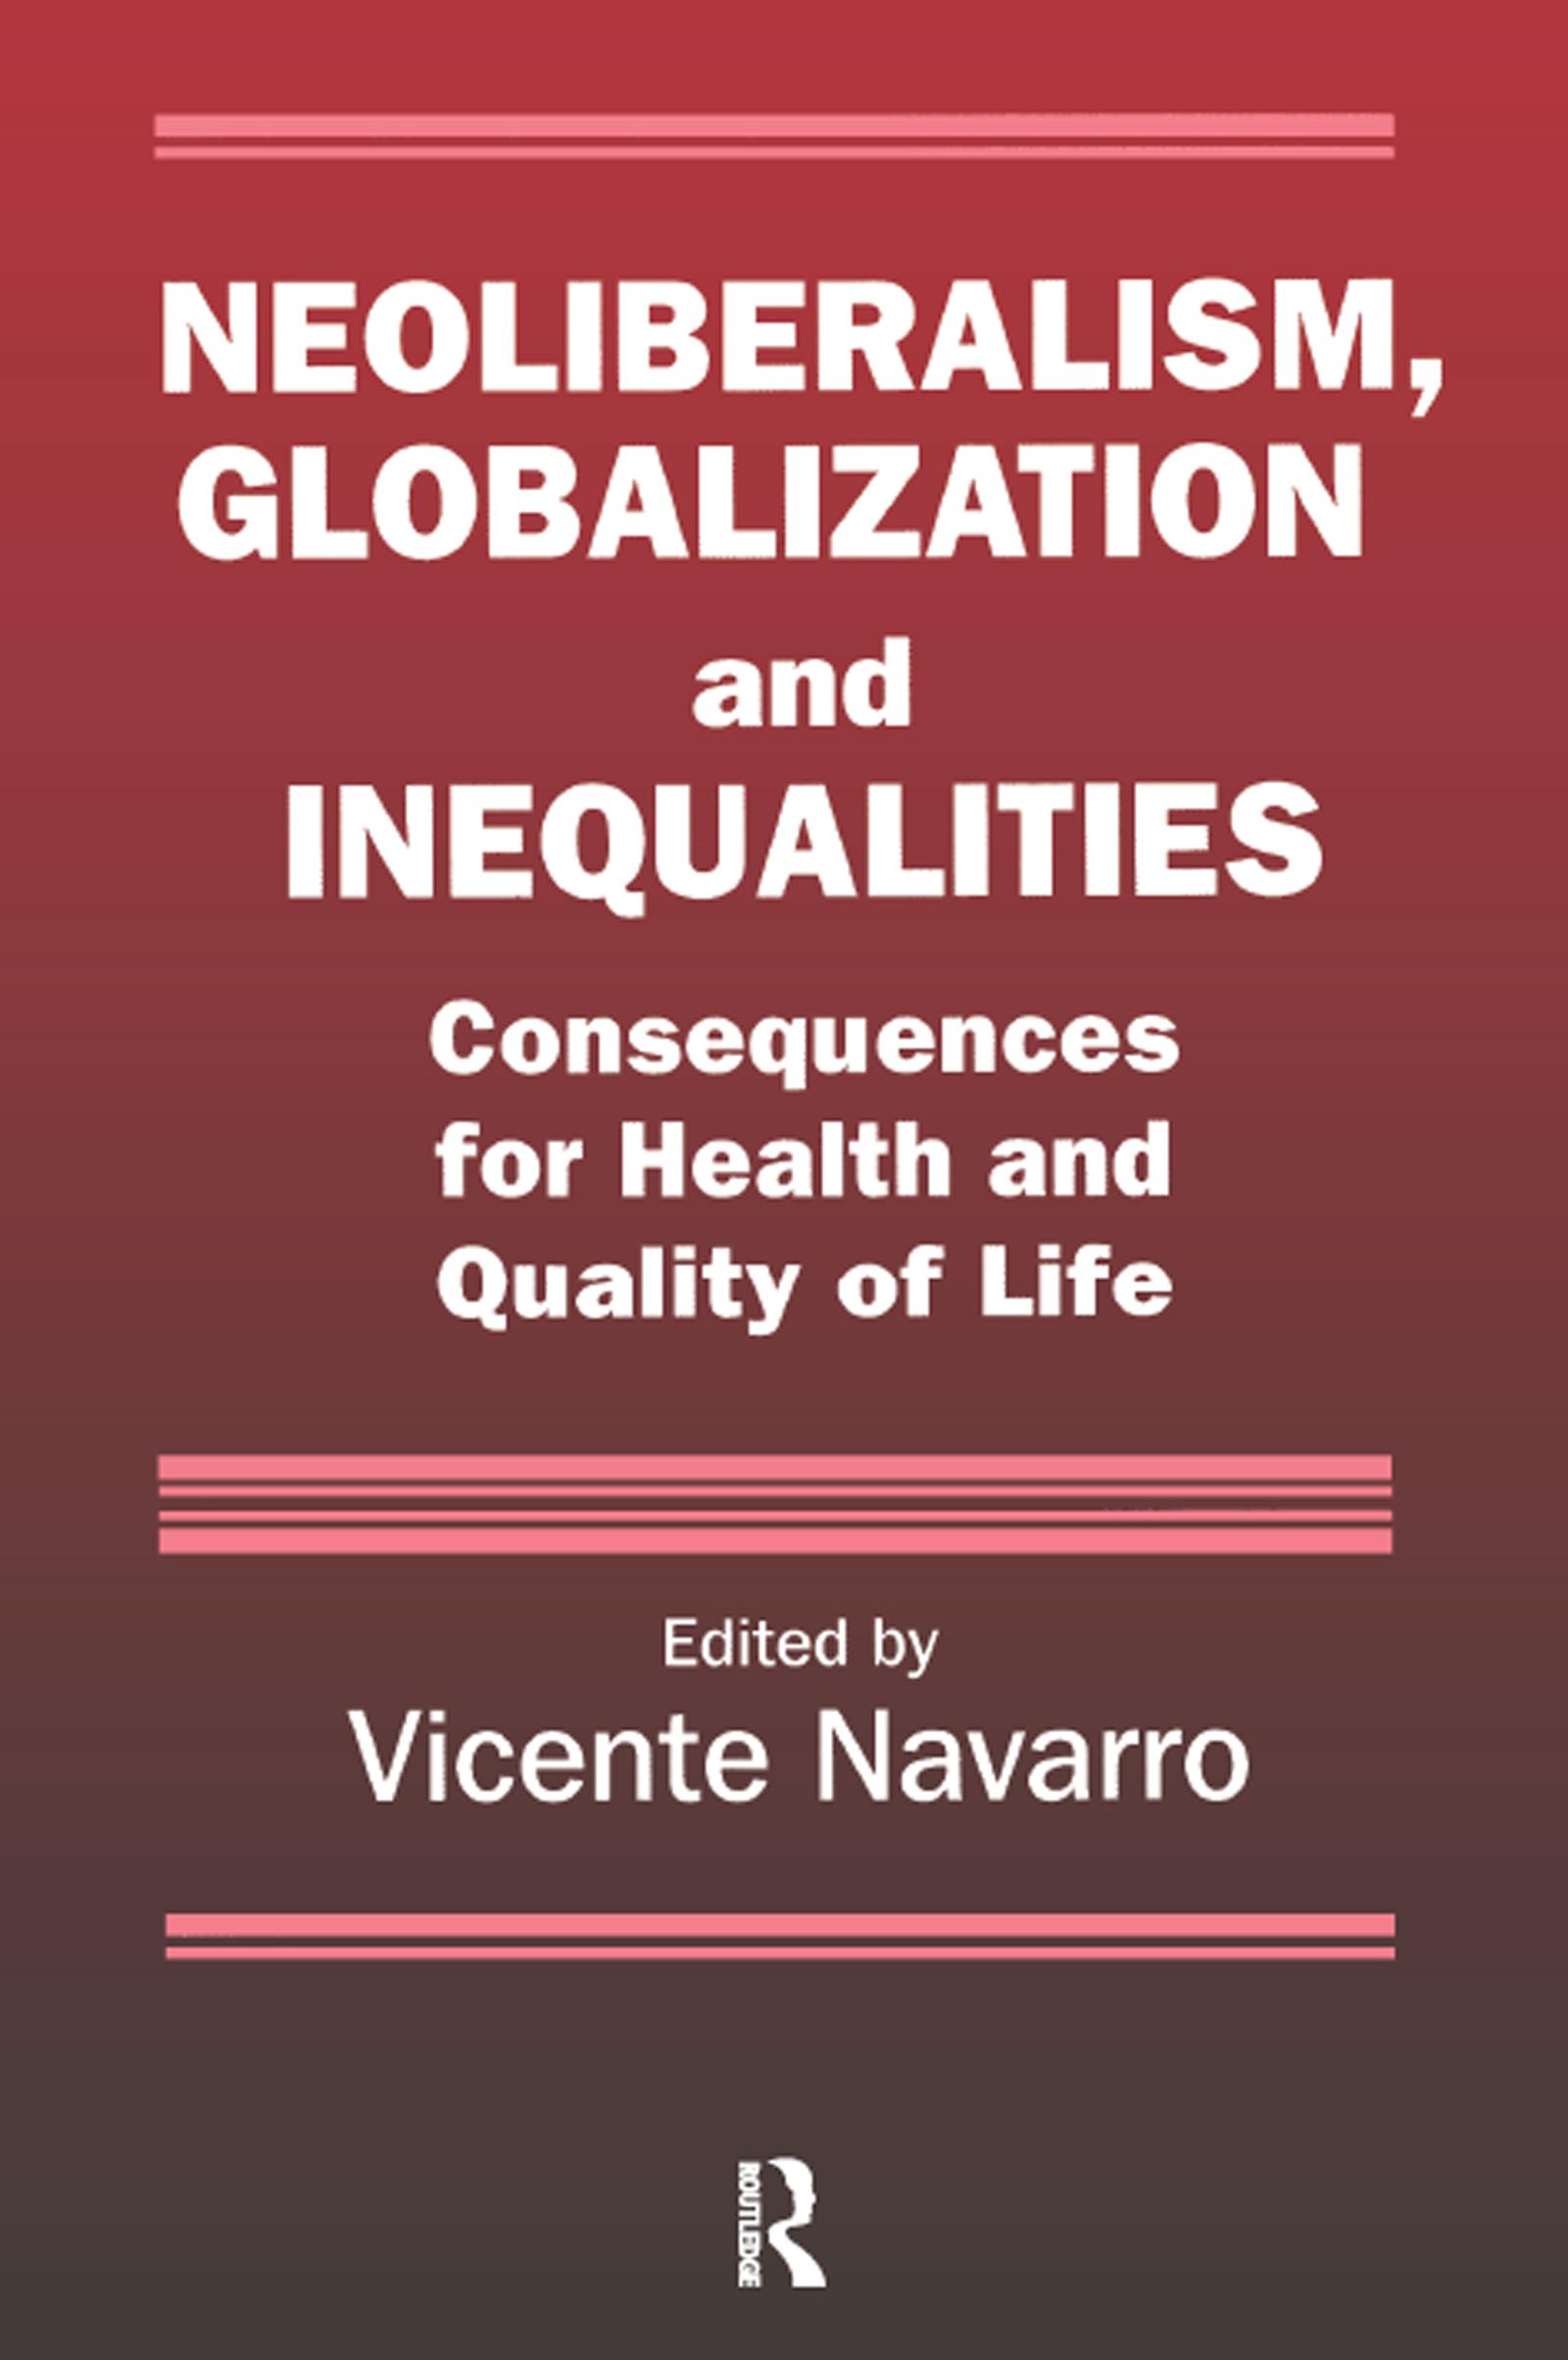 Economic Efficiency versus Social Equality? The U.S. Liberal Model versus The European Social Model